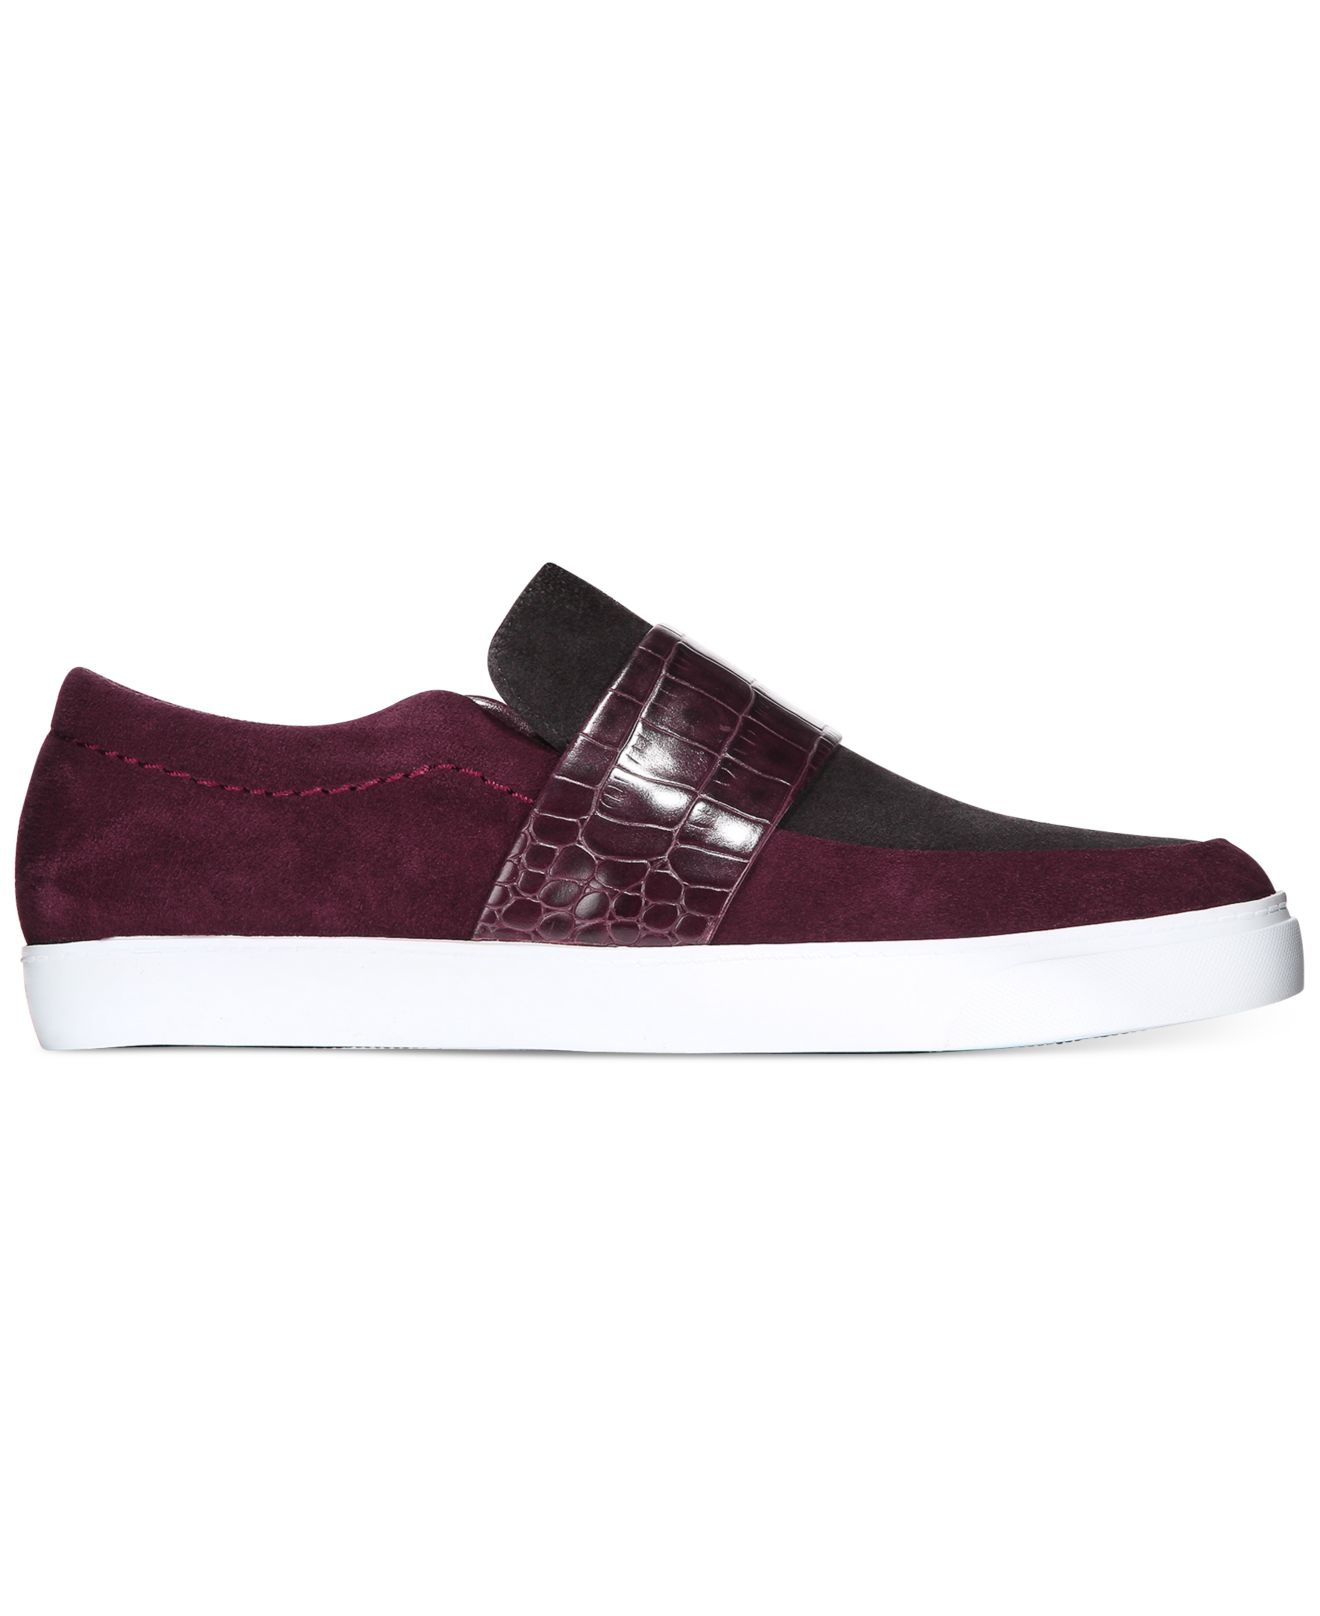 Clarks Somerset Women's Glove Candy Slip-on Sneakers in ...